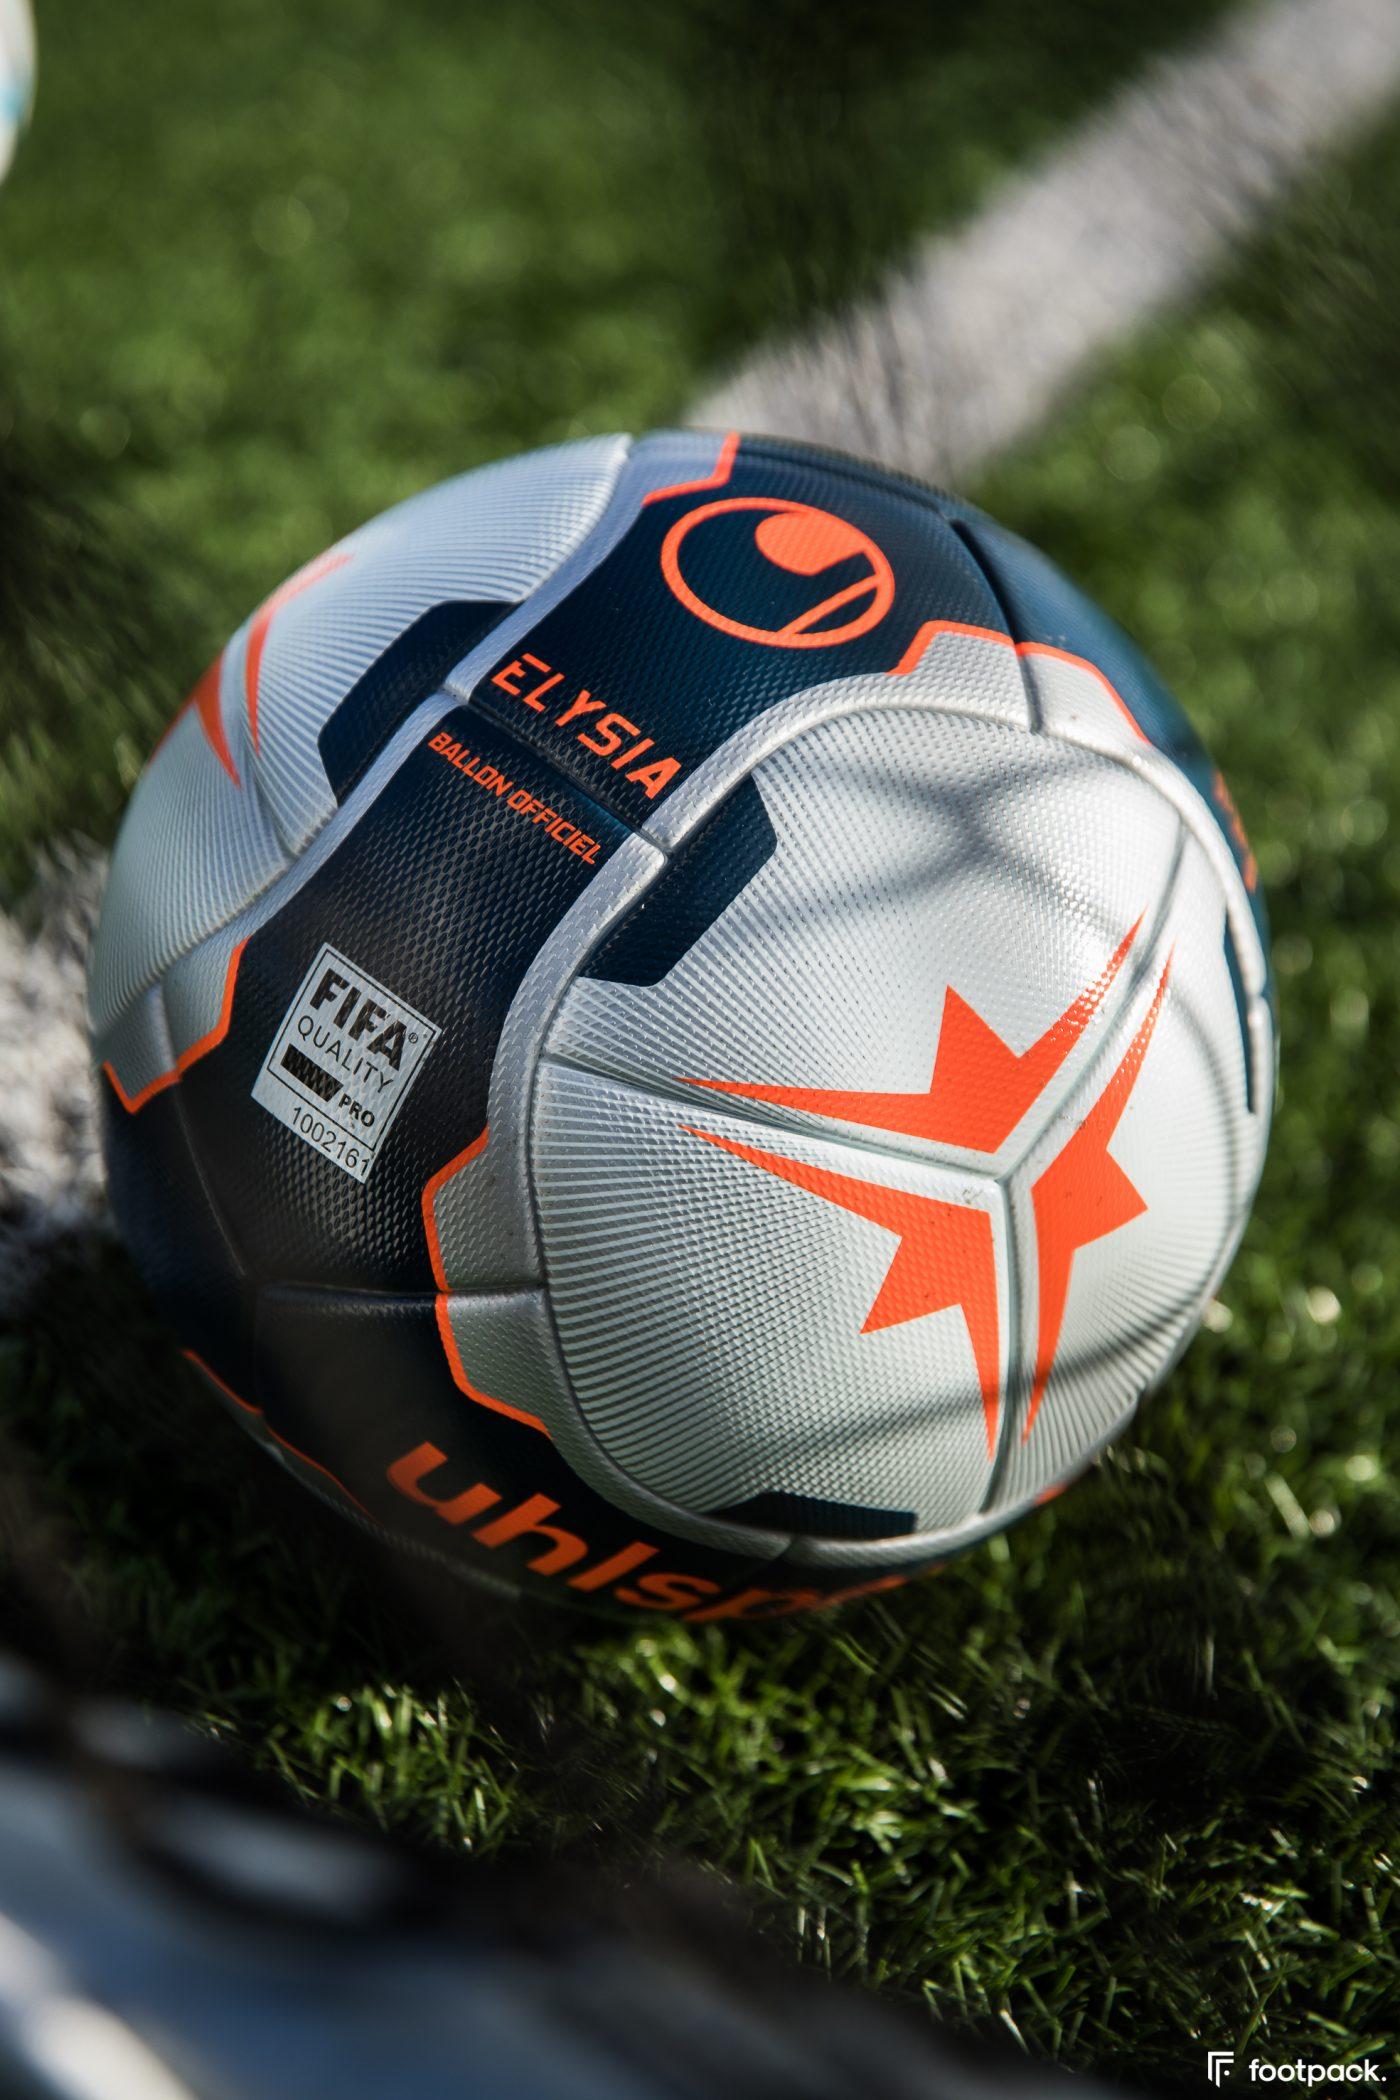 ballon-uhlsport-ligue-1-2020-2021-footpack-2